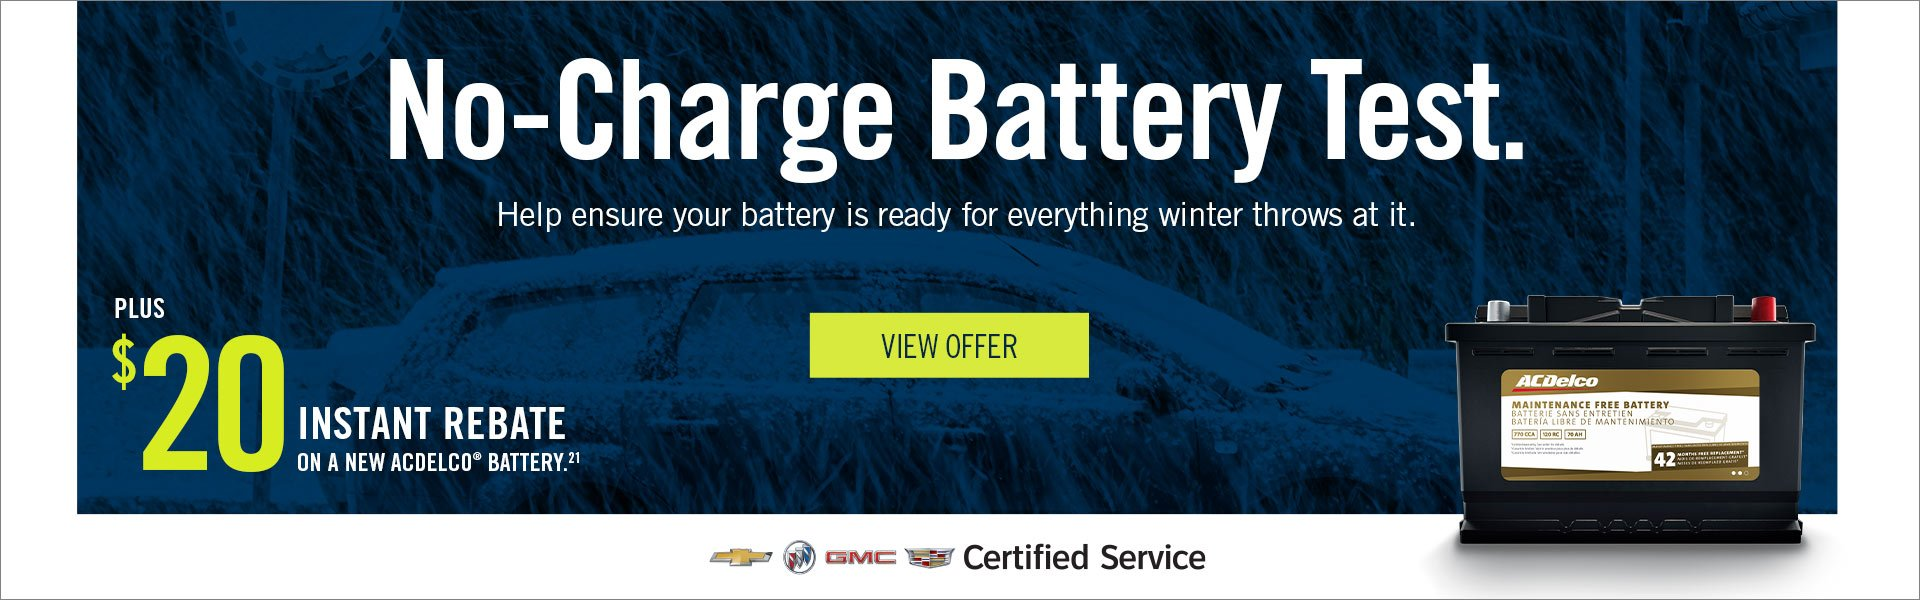 2020_DMA_December_Battery_T3_Tiles_EN_1920x600